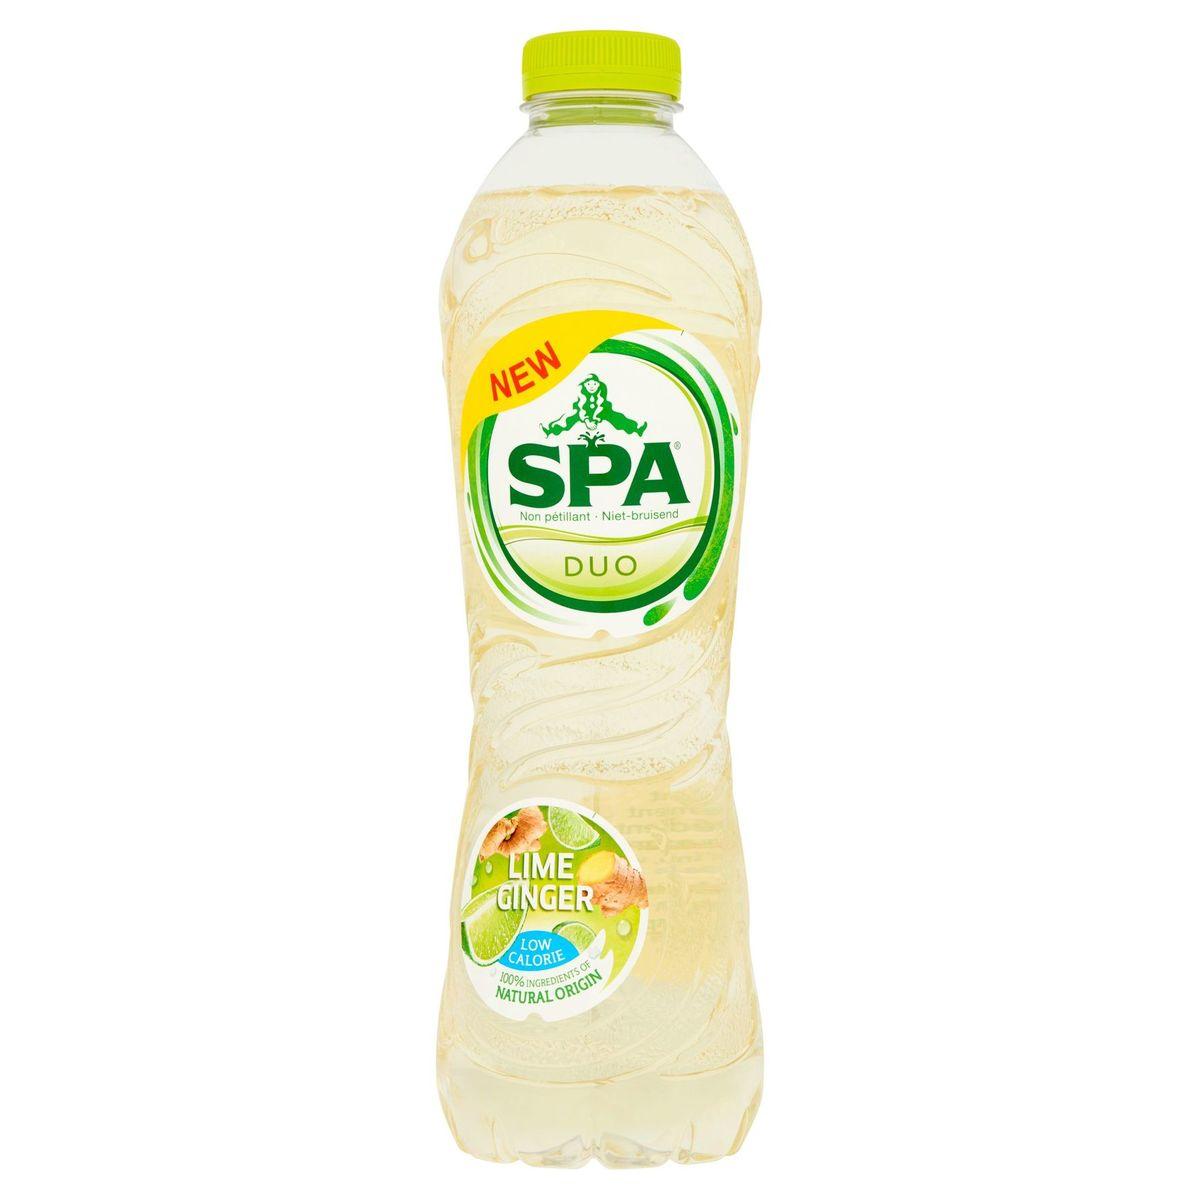 Spa Duo Limoen - Gember Niet-Bruisend PET 1 L